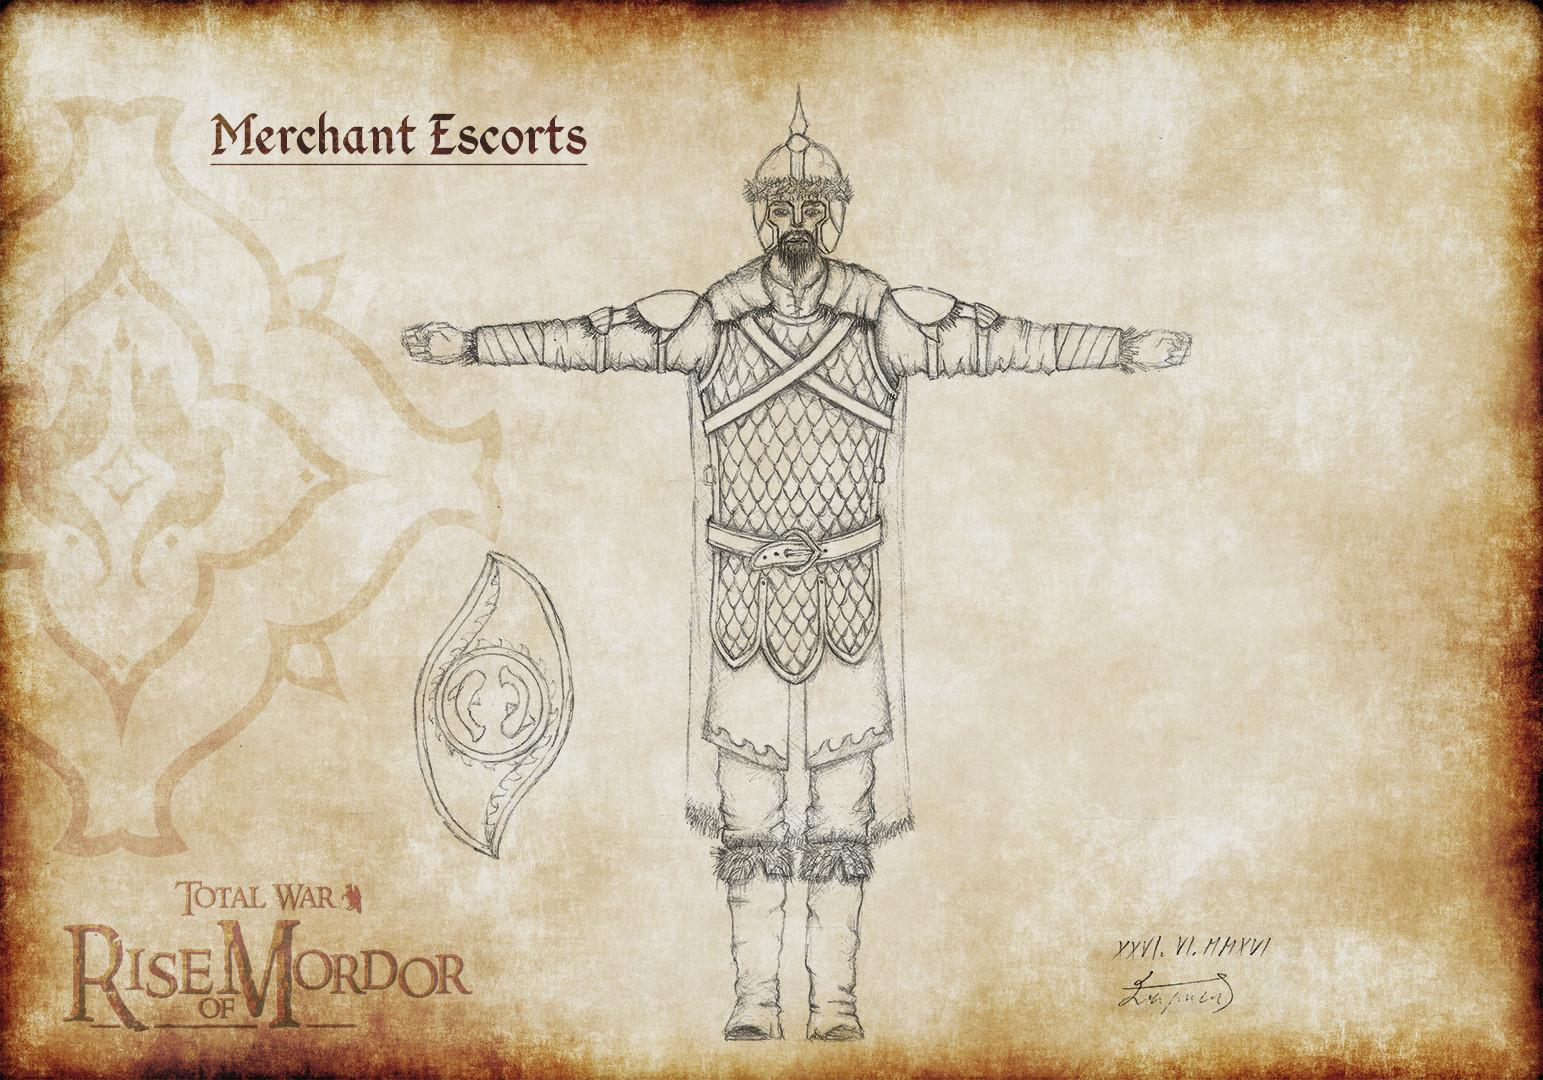 Adam dotlacil concept merchant escorts